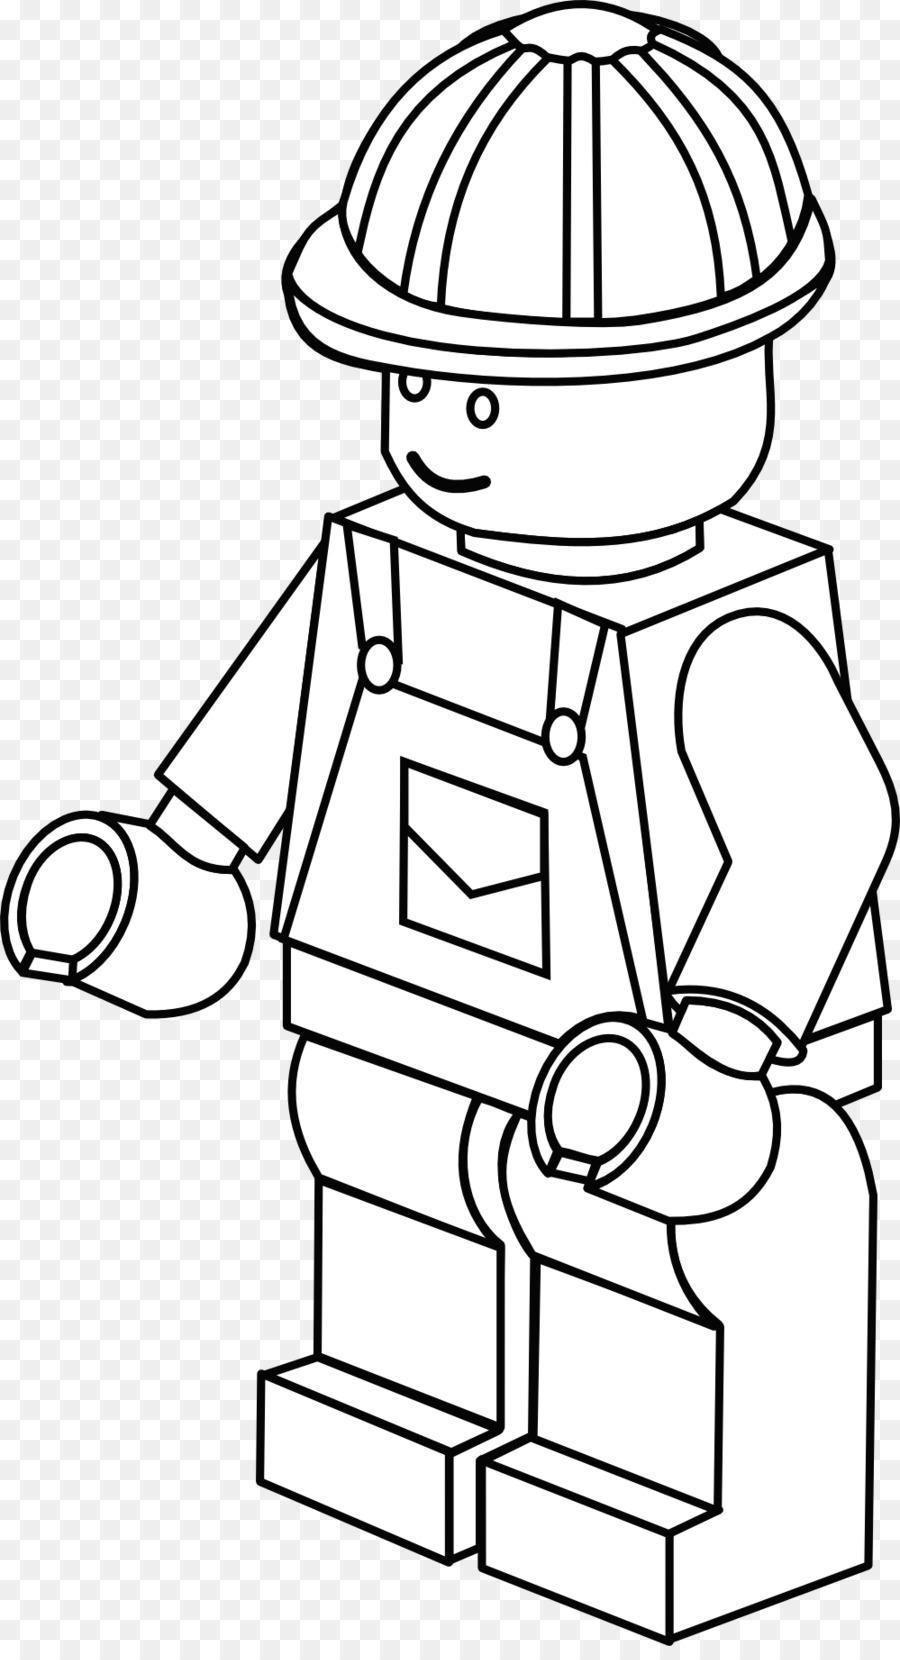 Páginas para colorear libro para Colorear Lego minifigures Bombero ...